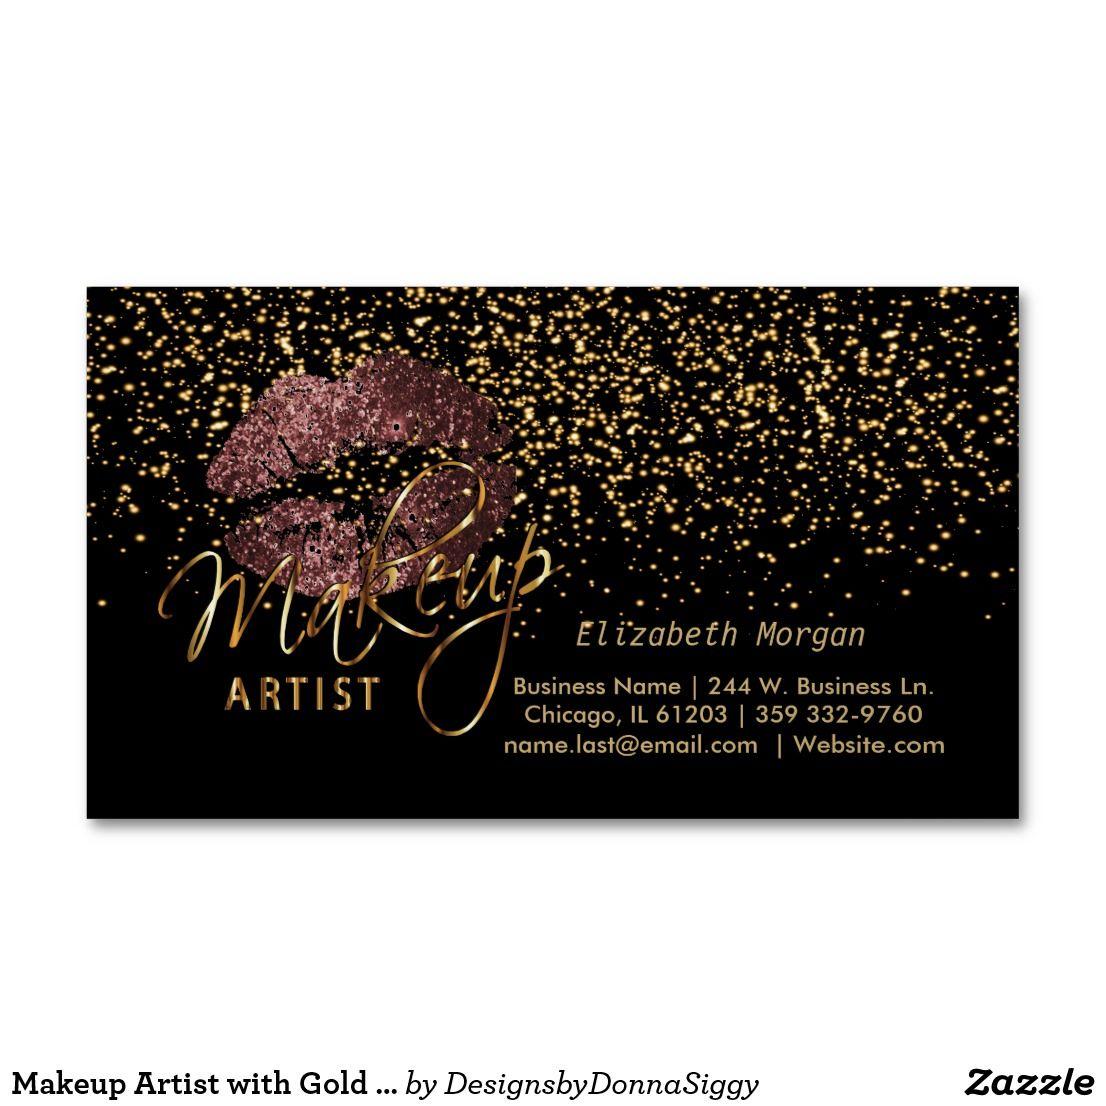 Makeup Artist with Gold Confetti & Dark Rose Lips Business Card Magnet | Elegant Make up artist beauty professional business card | #businesscards #businesscard